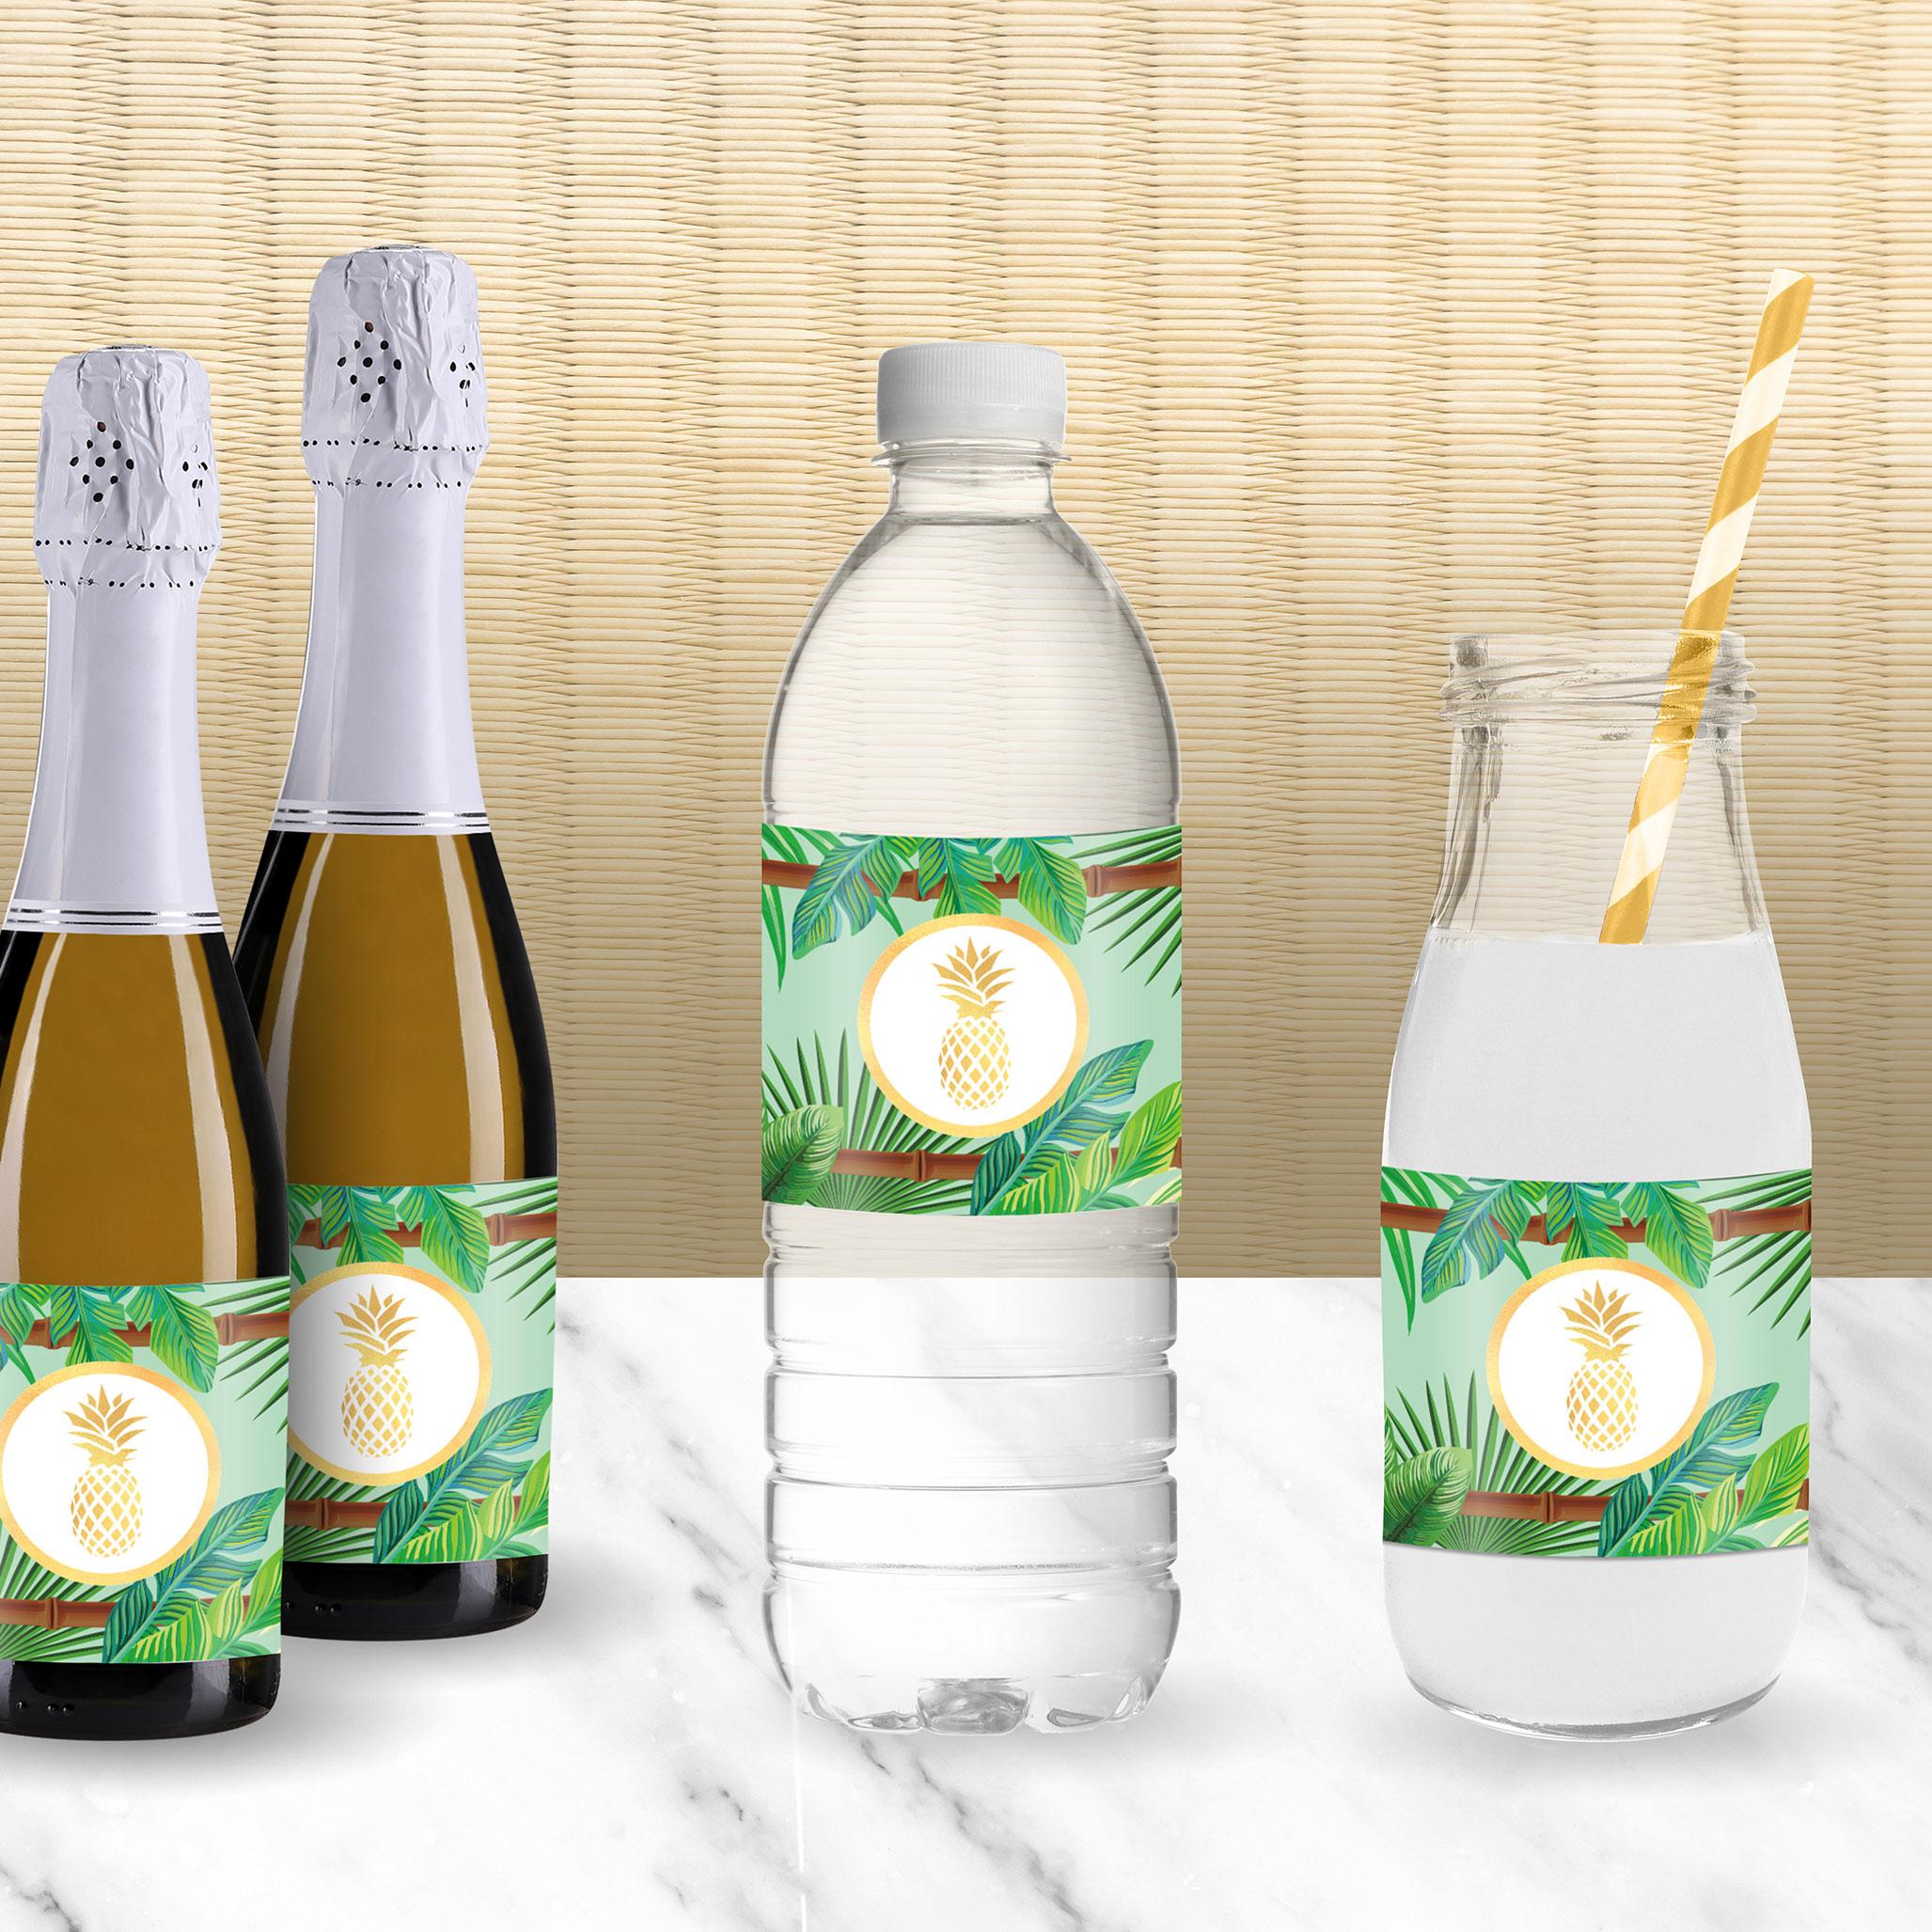 Bottle Wraps